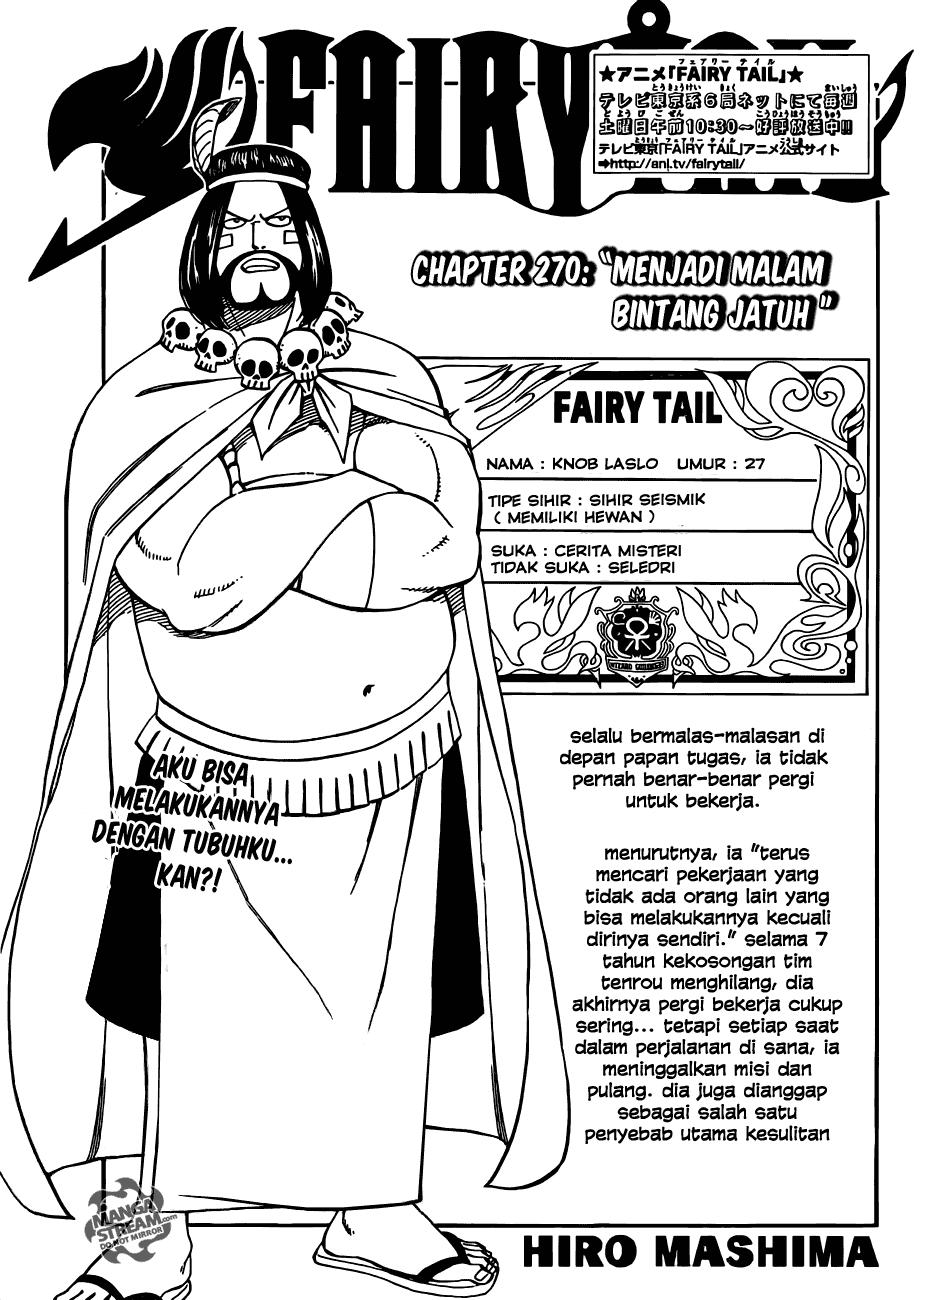 Page01 Fairy Tail 270   Menjadi Malam Bintang bintang